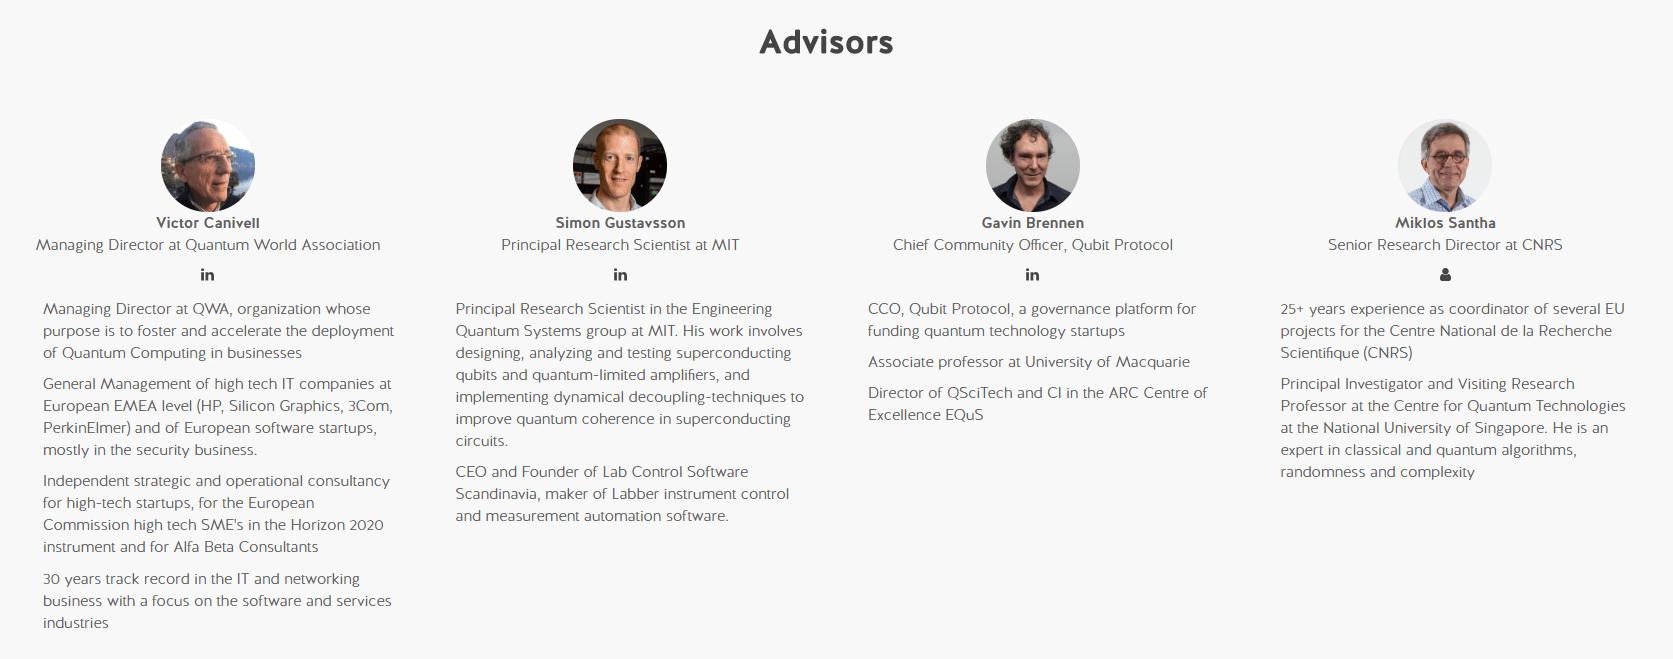 Qilimanjaro-Advisors.png